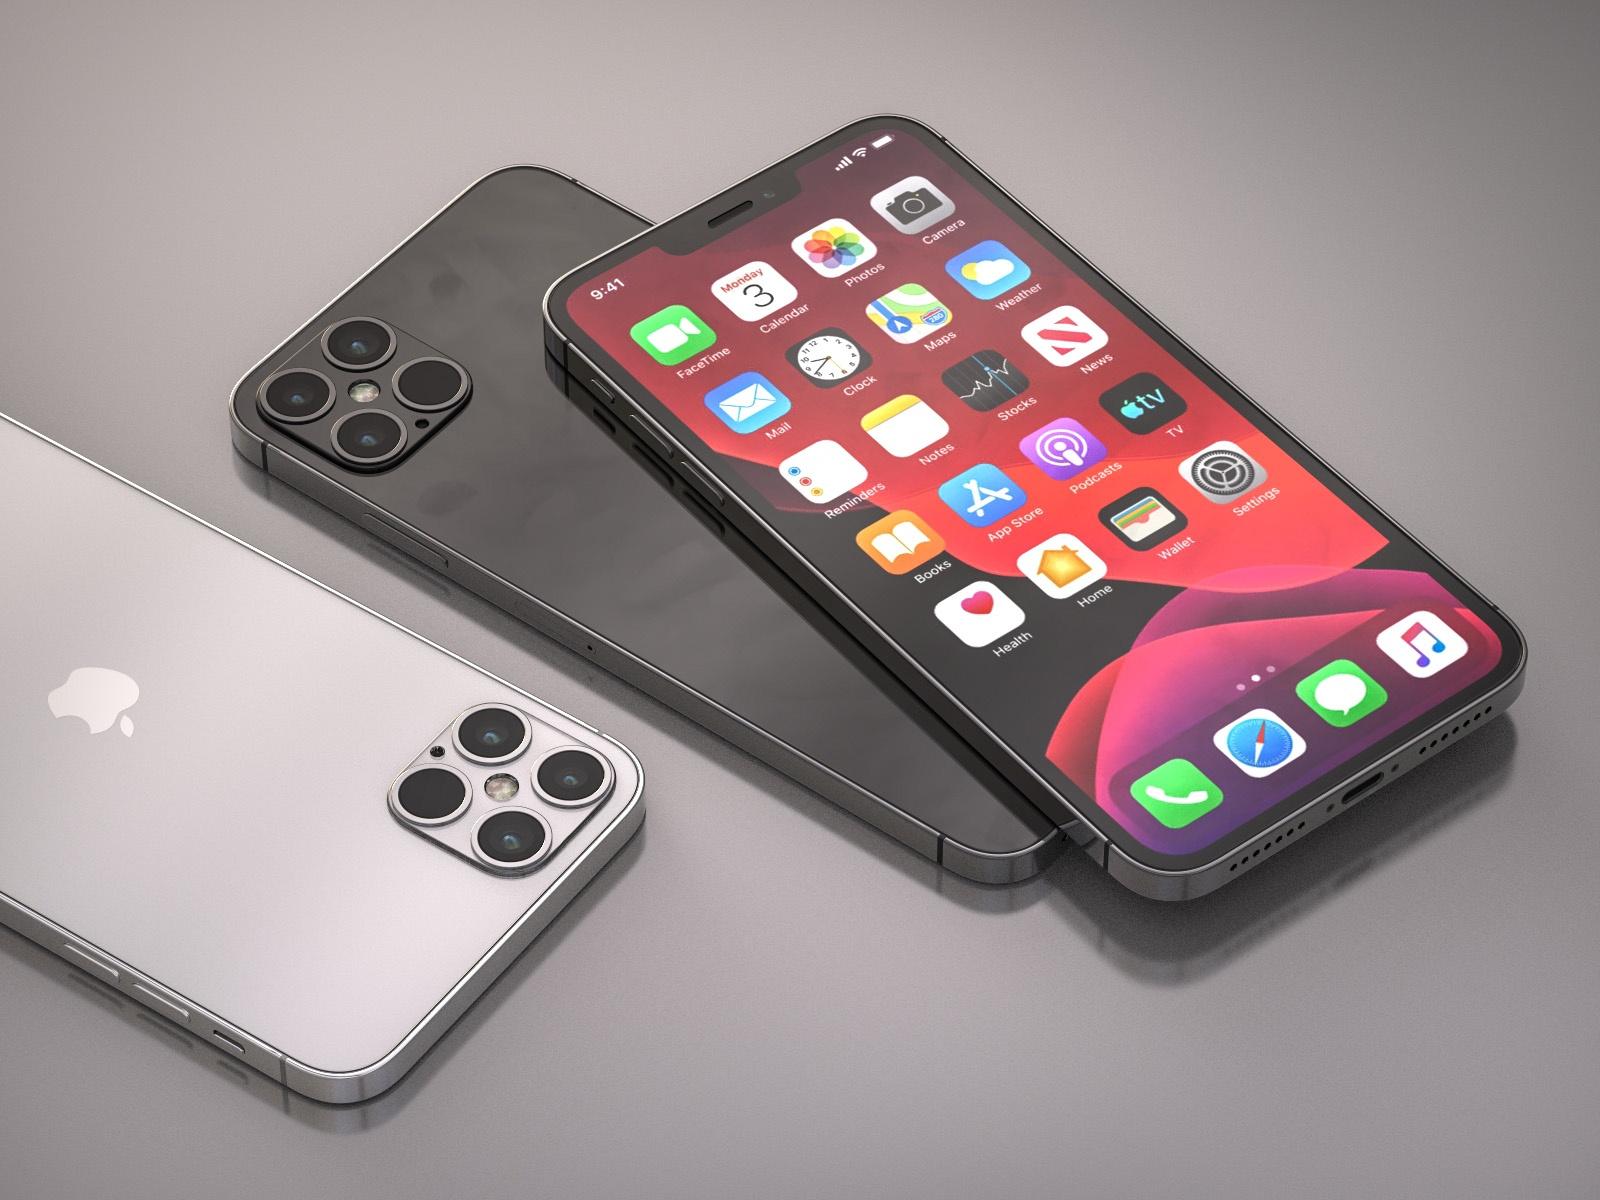 Chan dung iPhone 12 Pro qua tin don hinh anh 3 EVvpGraXYAM3Rp_.jpg